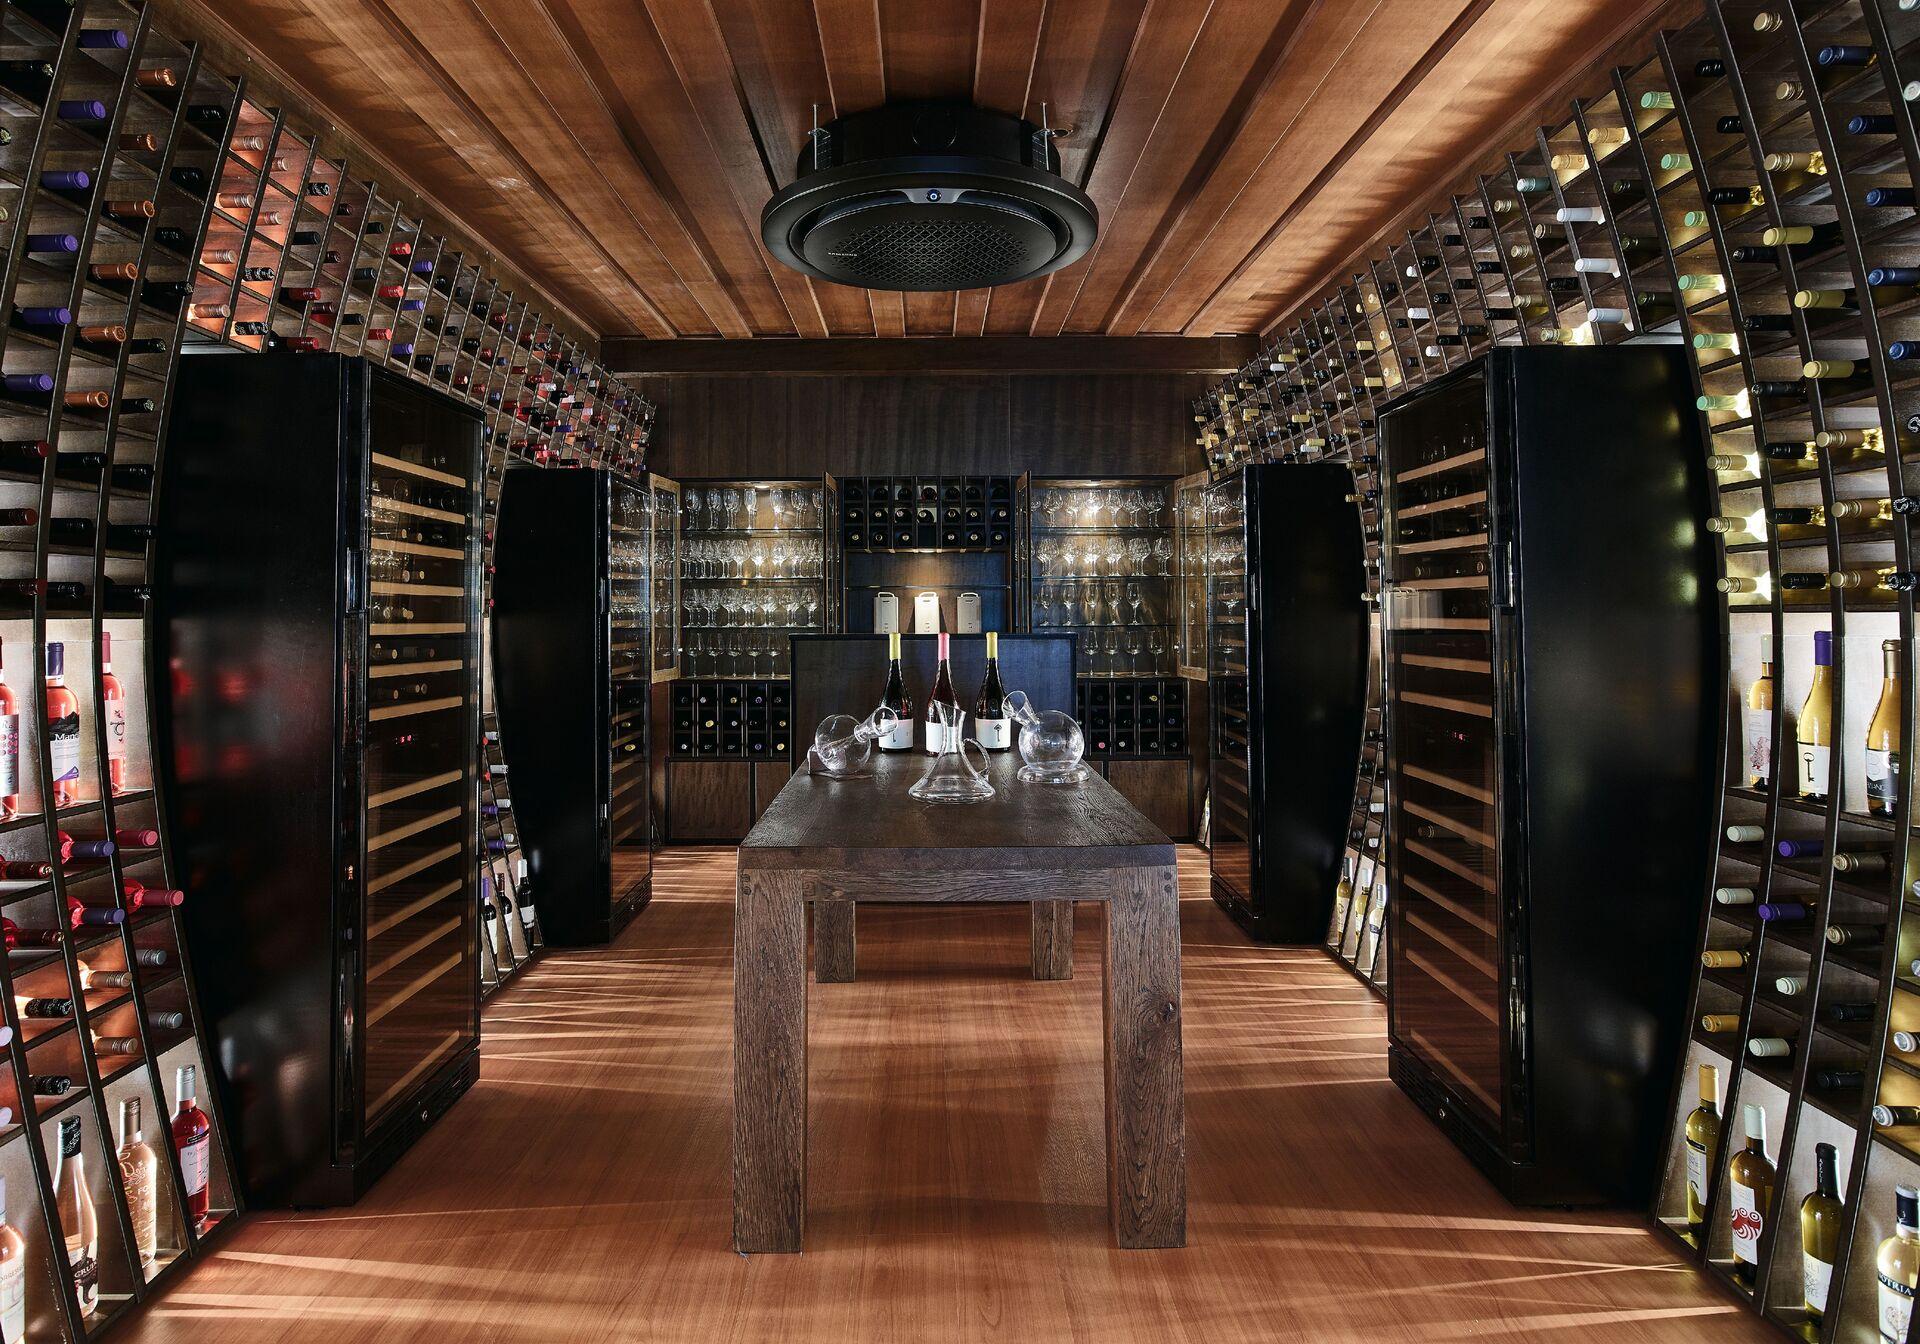 https://cms.satur.sk/data/imgs/tour_image/orig/13-il-barreto-cava-wines-wine-tasting-room_72dpi-1924852.jpg